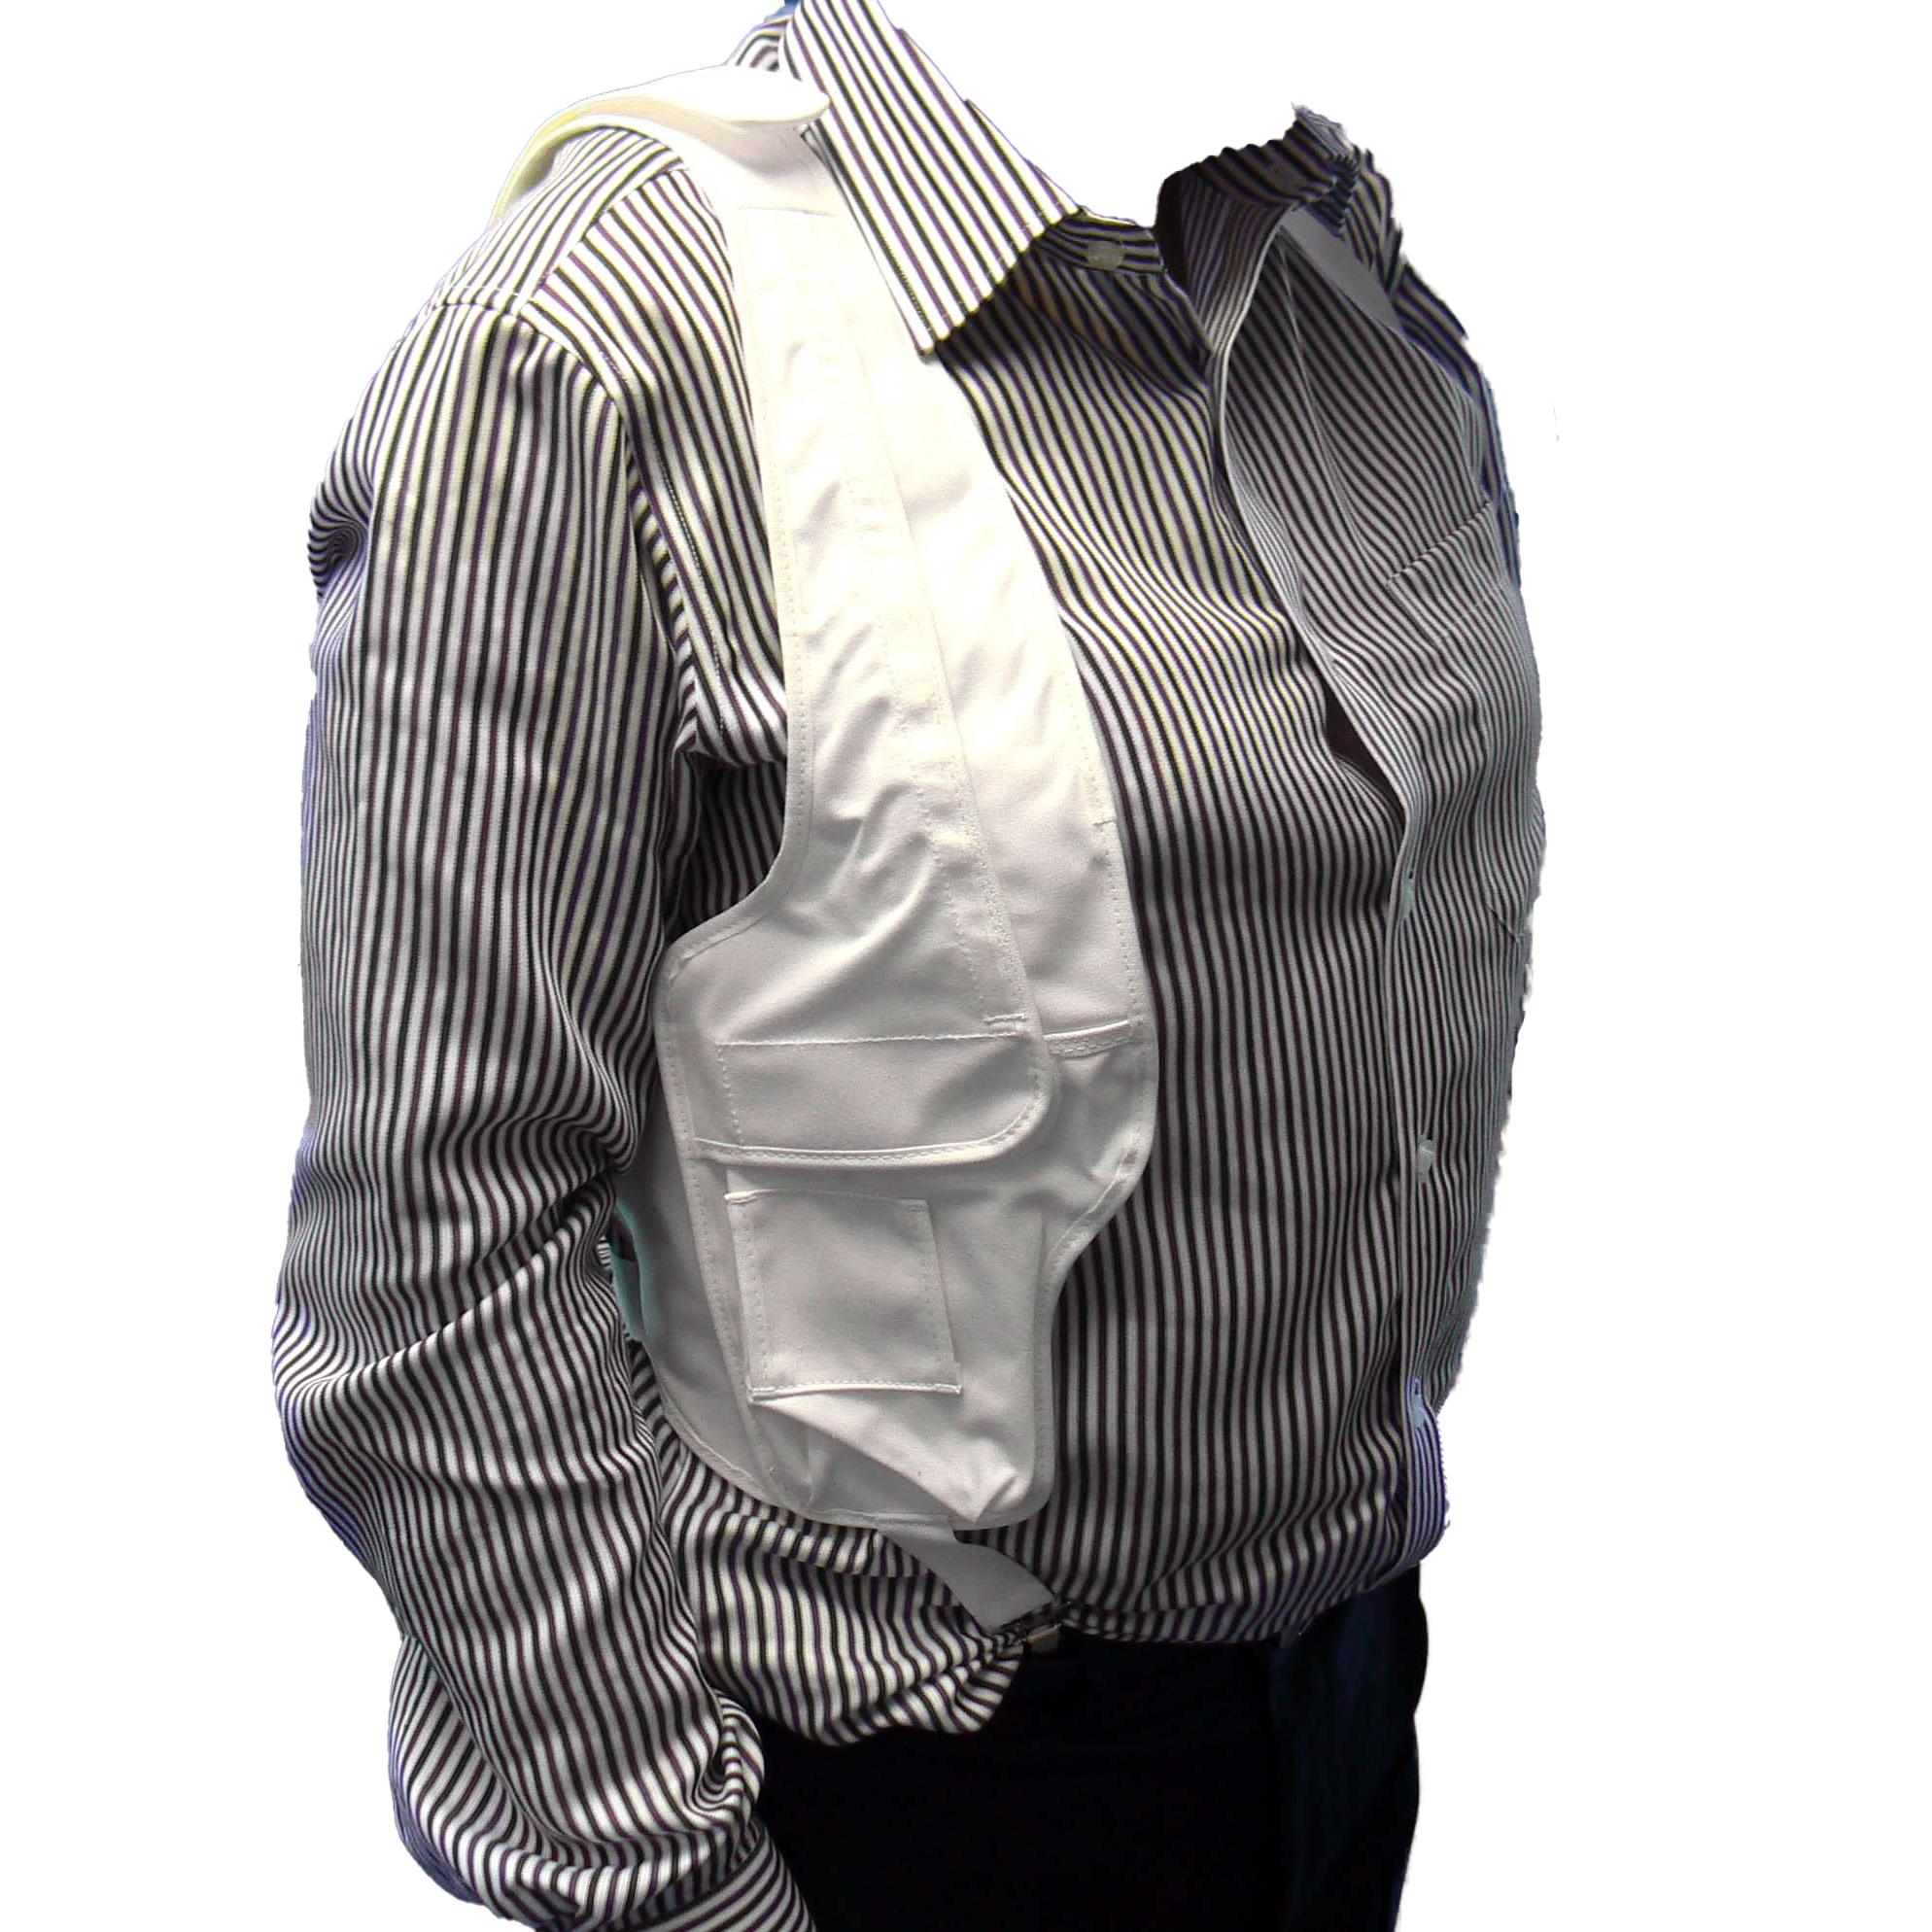 Shoulder harness covert radio harness